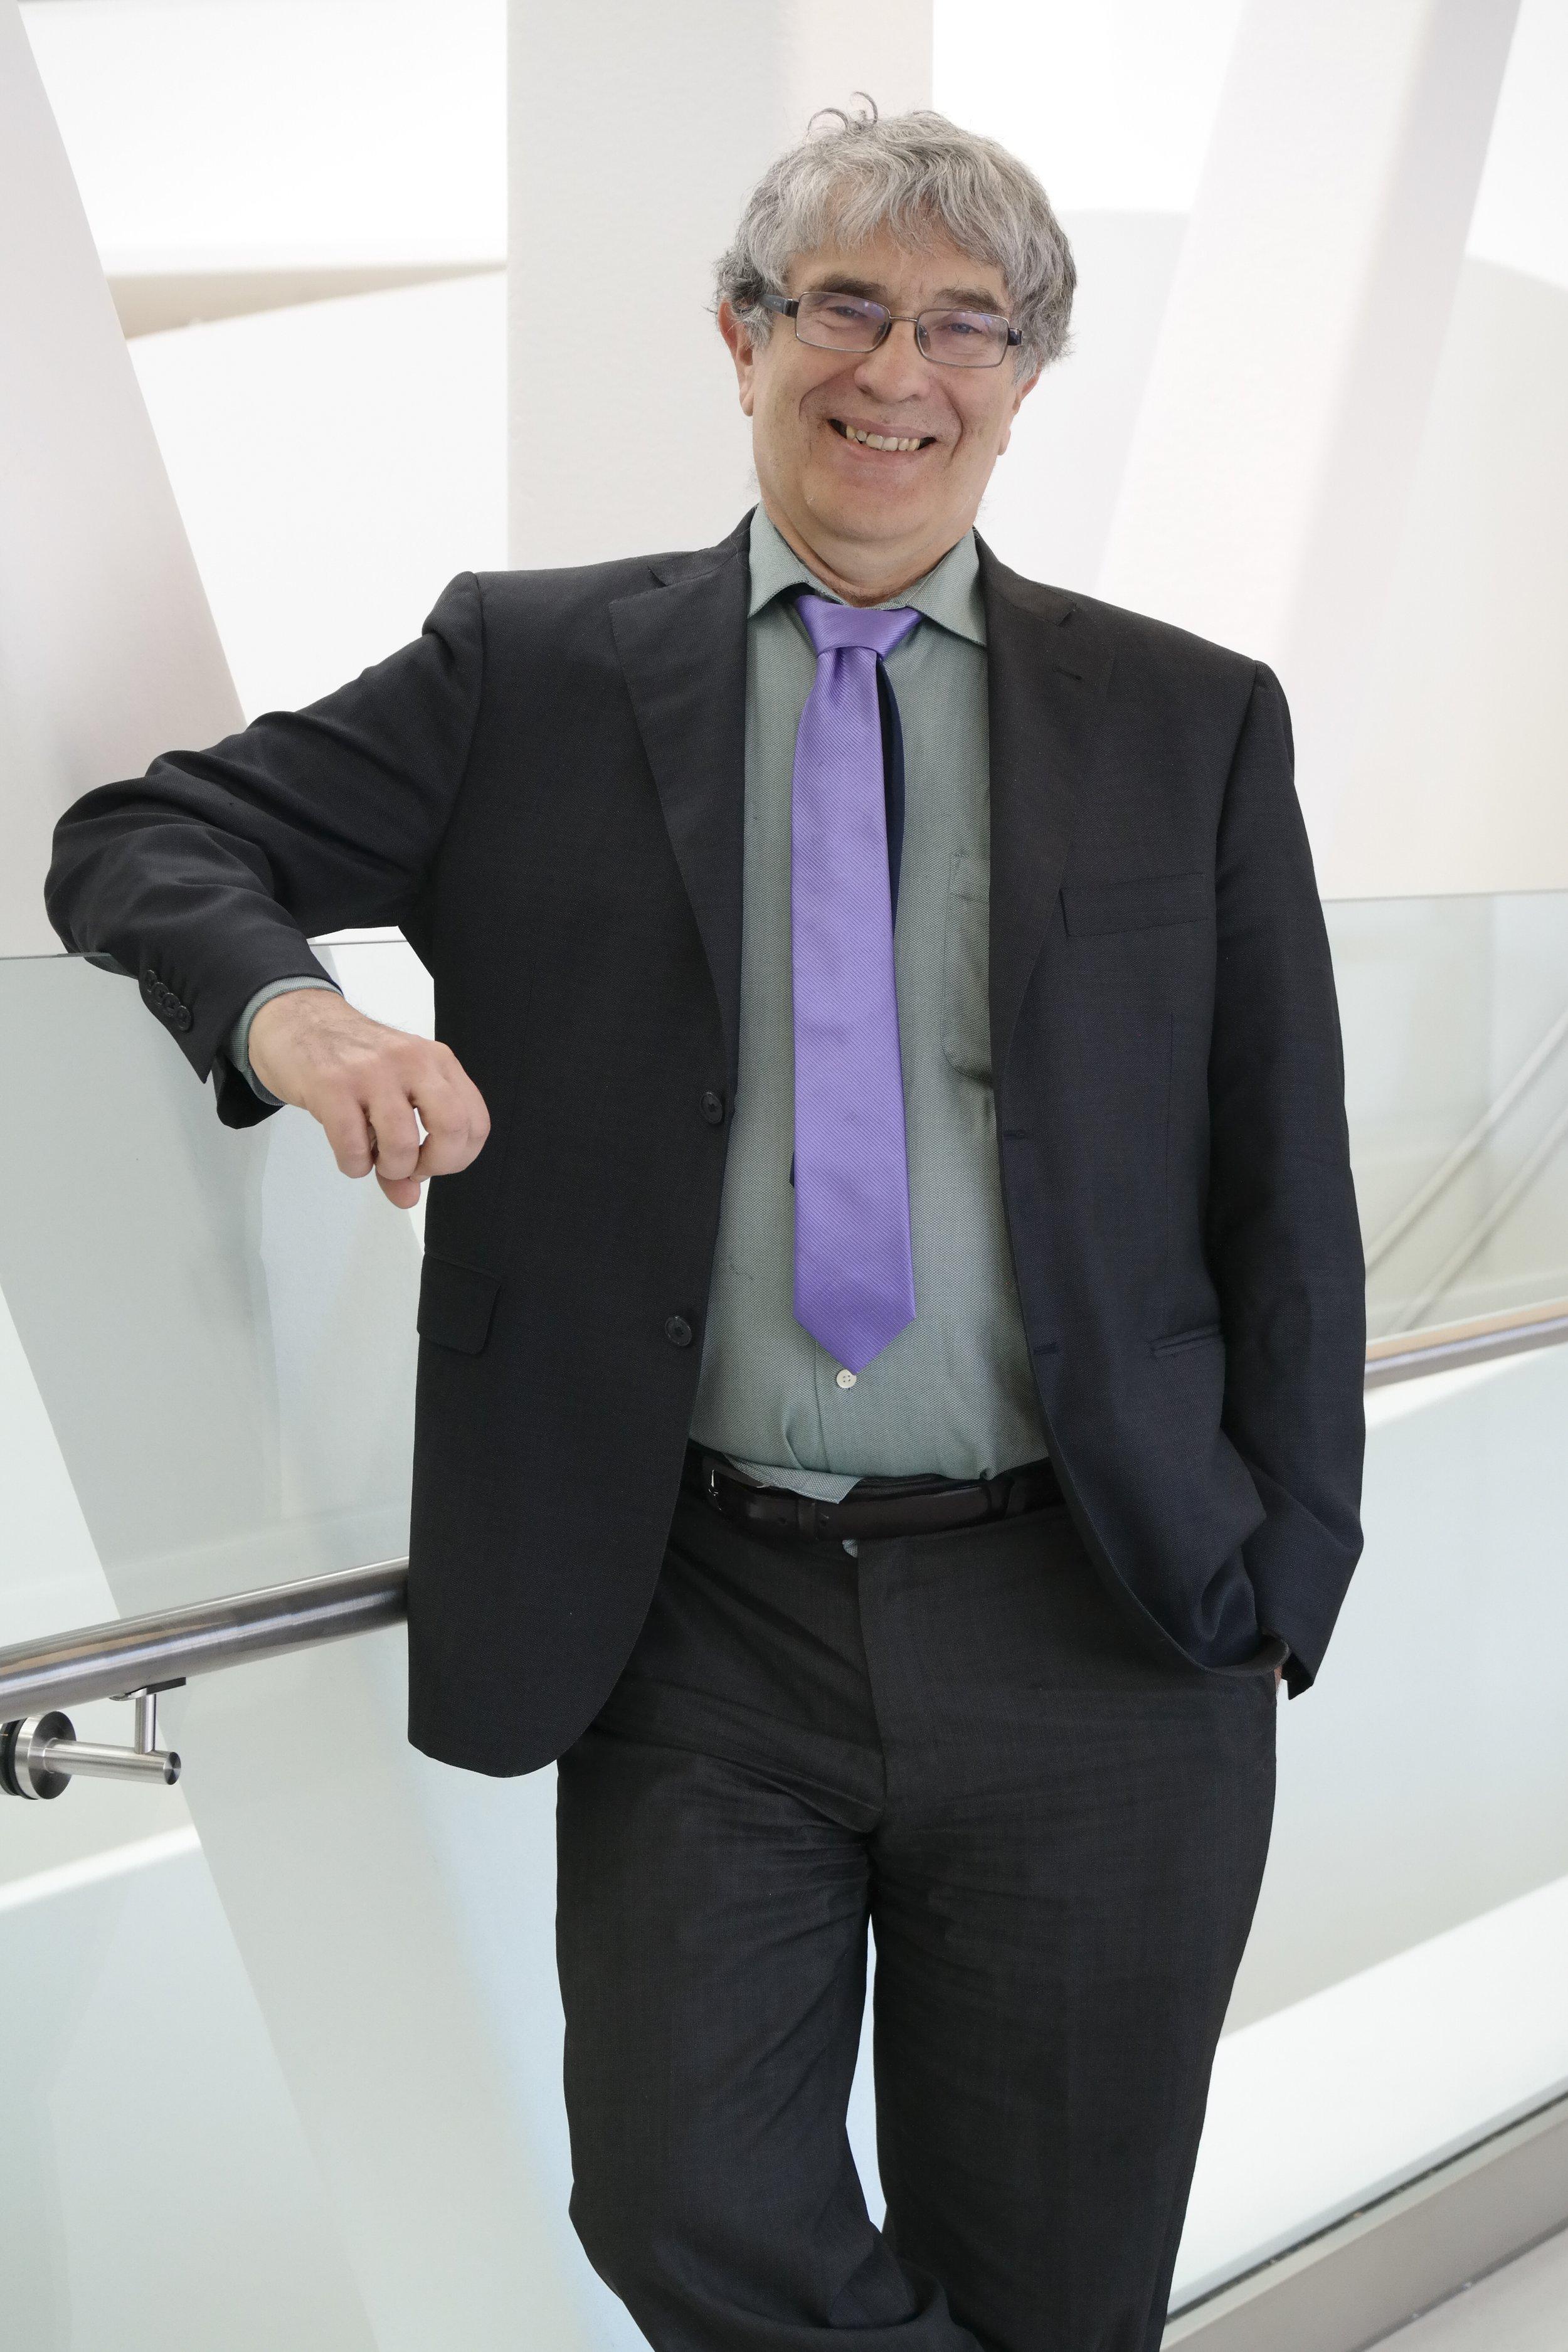 Dr. Meldon Kahan